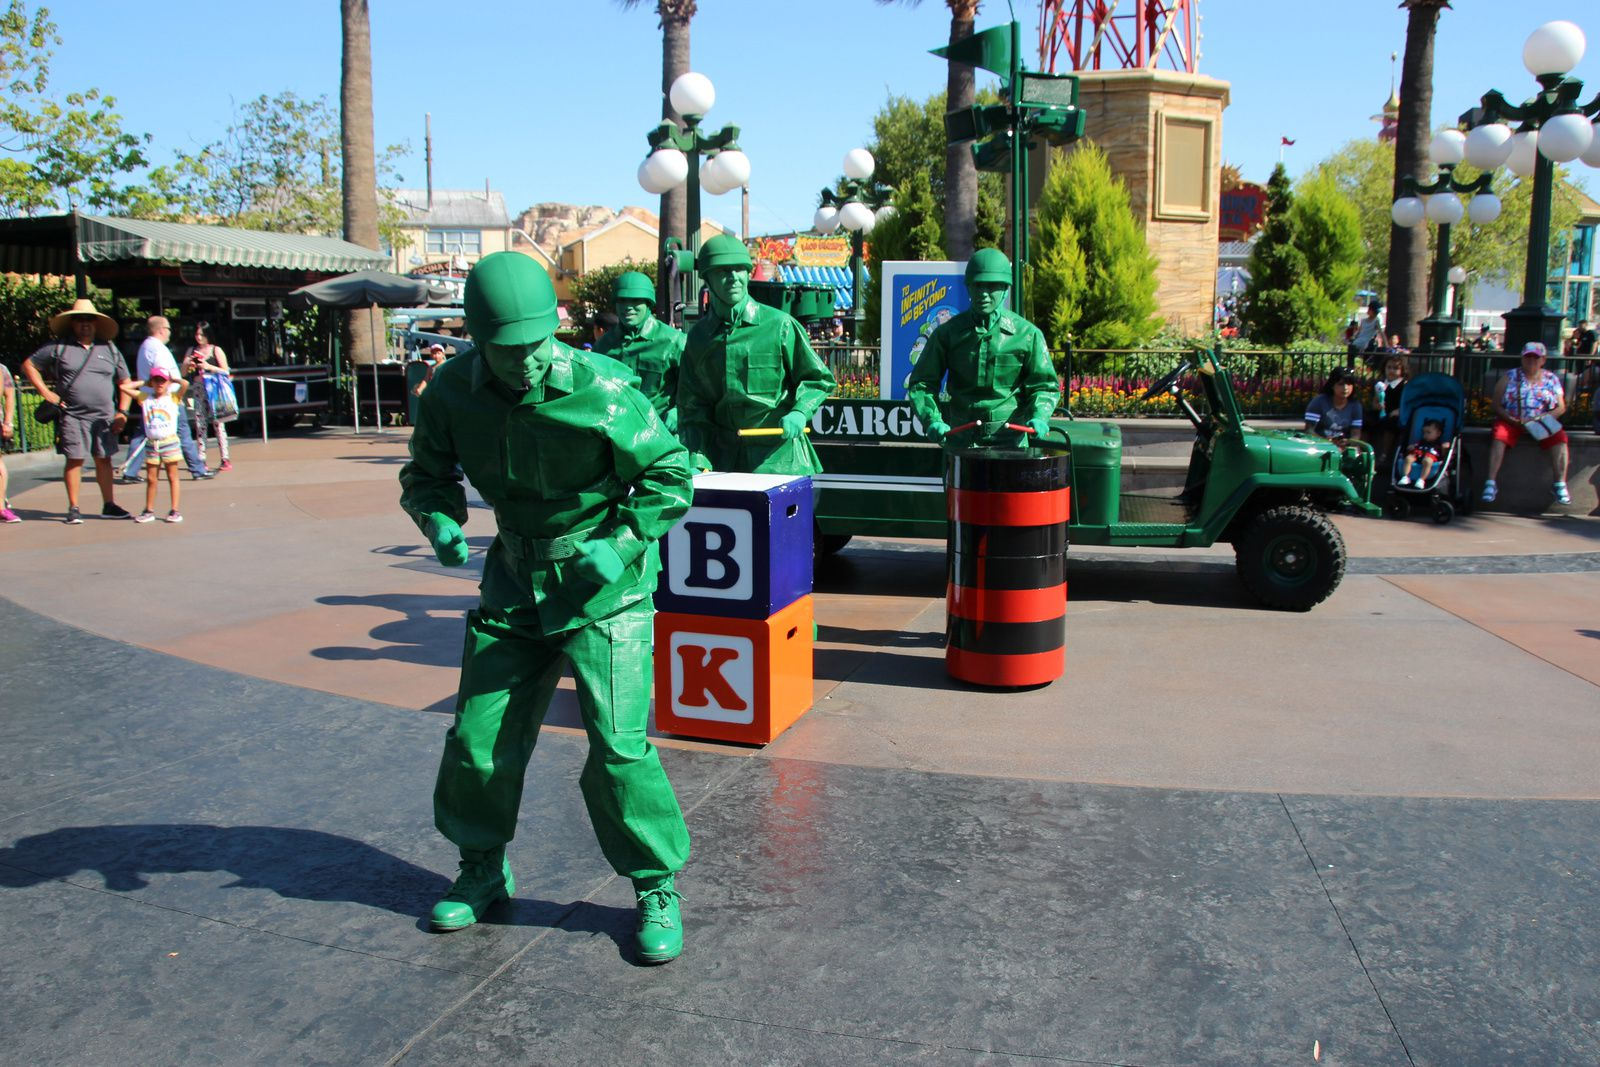 Pixar Play Parade & Operation: Playtime!, les spectacles Pixar à Disney California Adventure (Disneyland Resort)